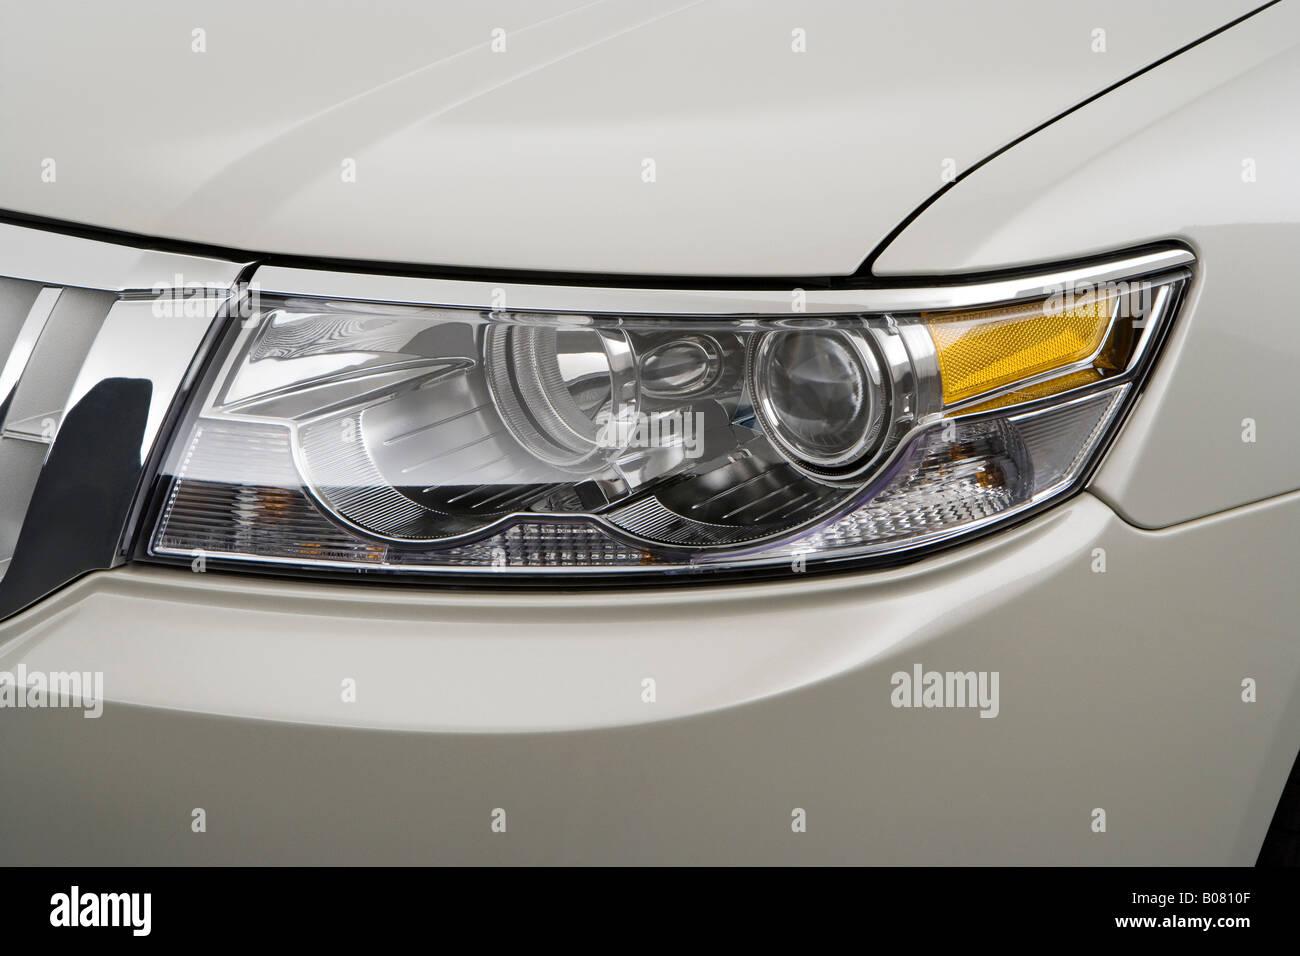 2008 Lincoln MKZ 3.5L V6 in Beige - Headlight - Stock Image